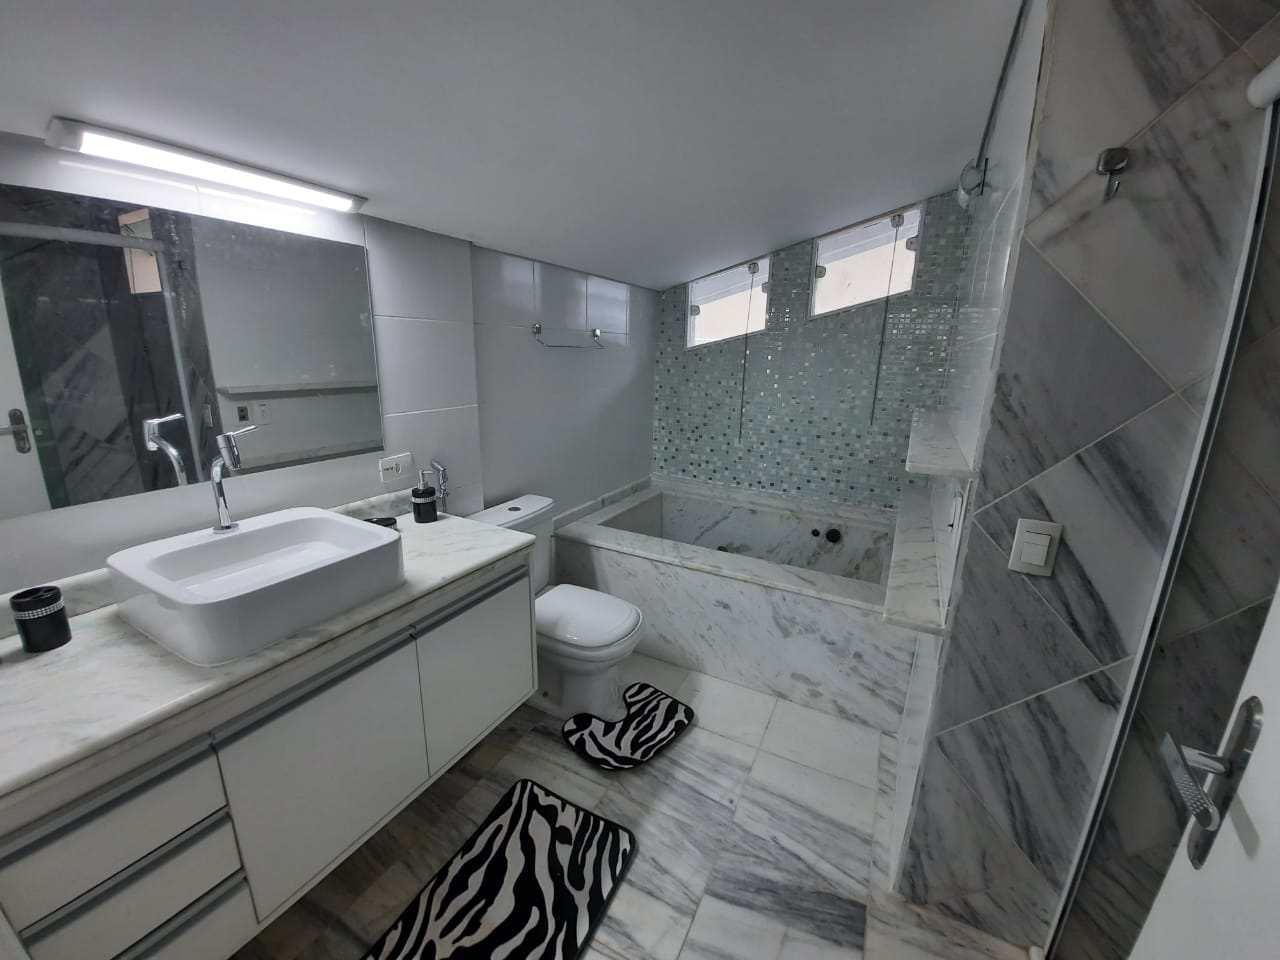 Casa de Condomínio com 4 dorms, Acapulco, Guarujá - R$ 2.1 mi, Cod: 2971